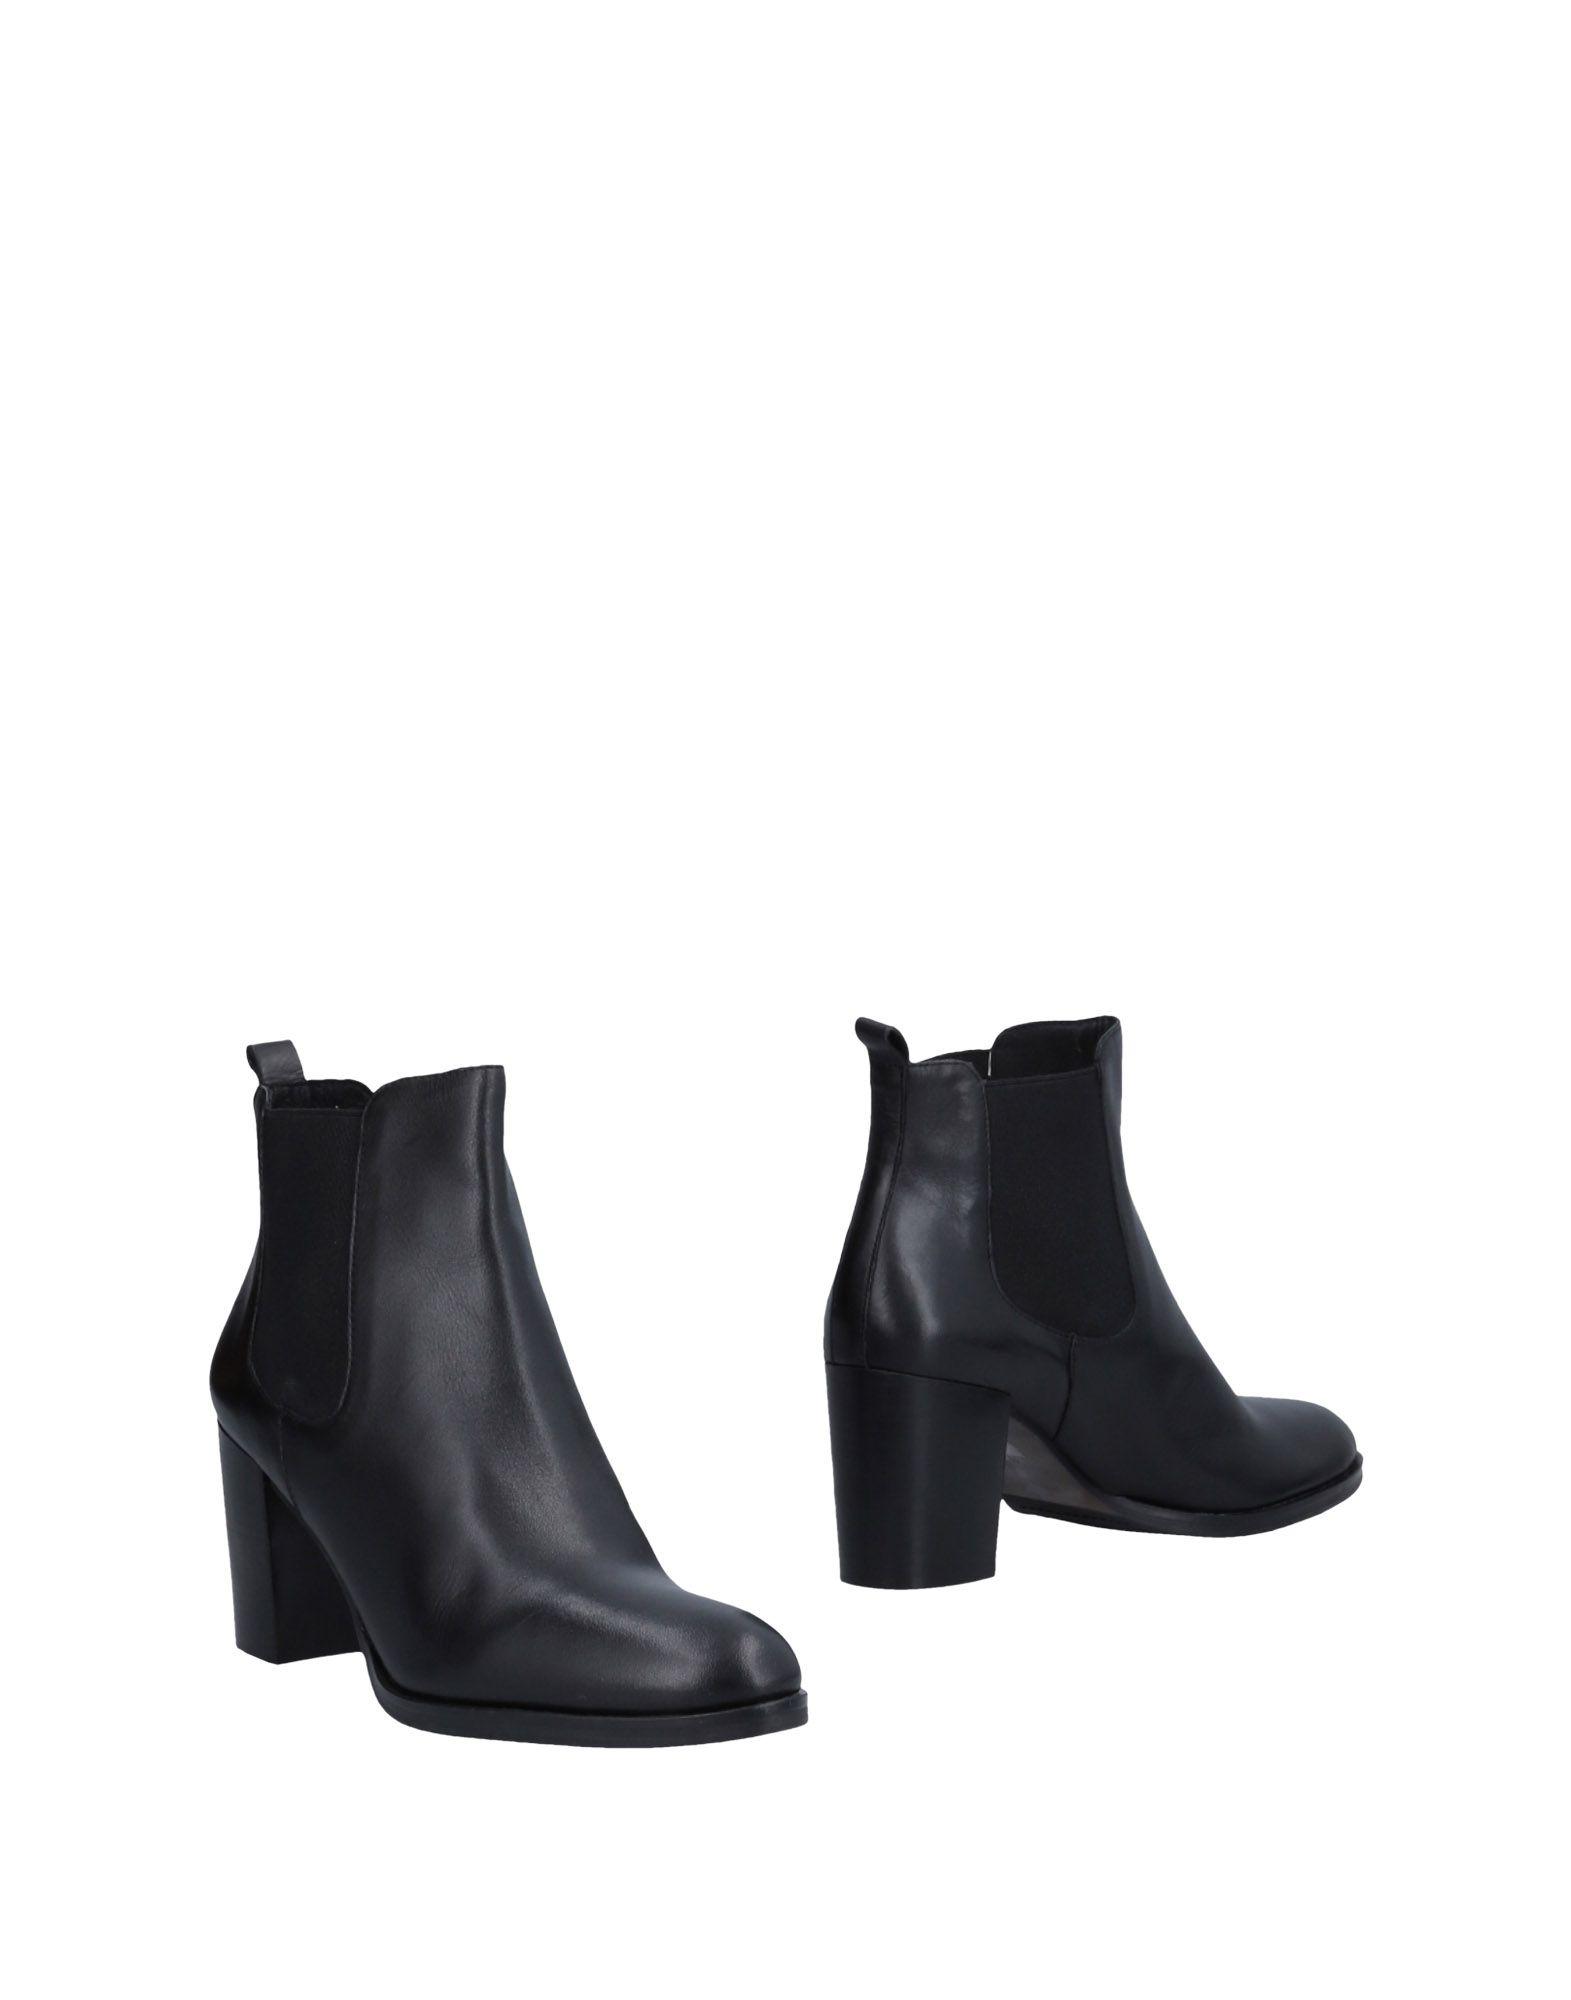 Cuoieria Chelsea Boots Qualität Damen  11487336MN Gute Qualität Boots beliebte Schuhe c6f264